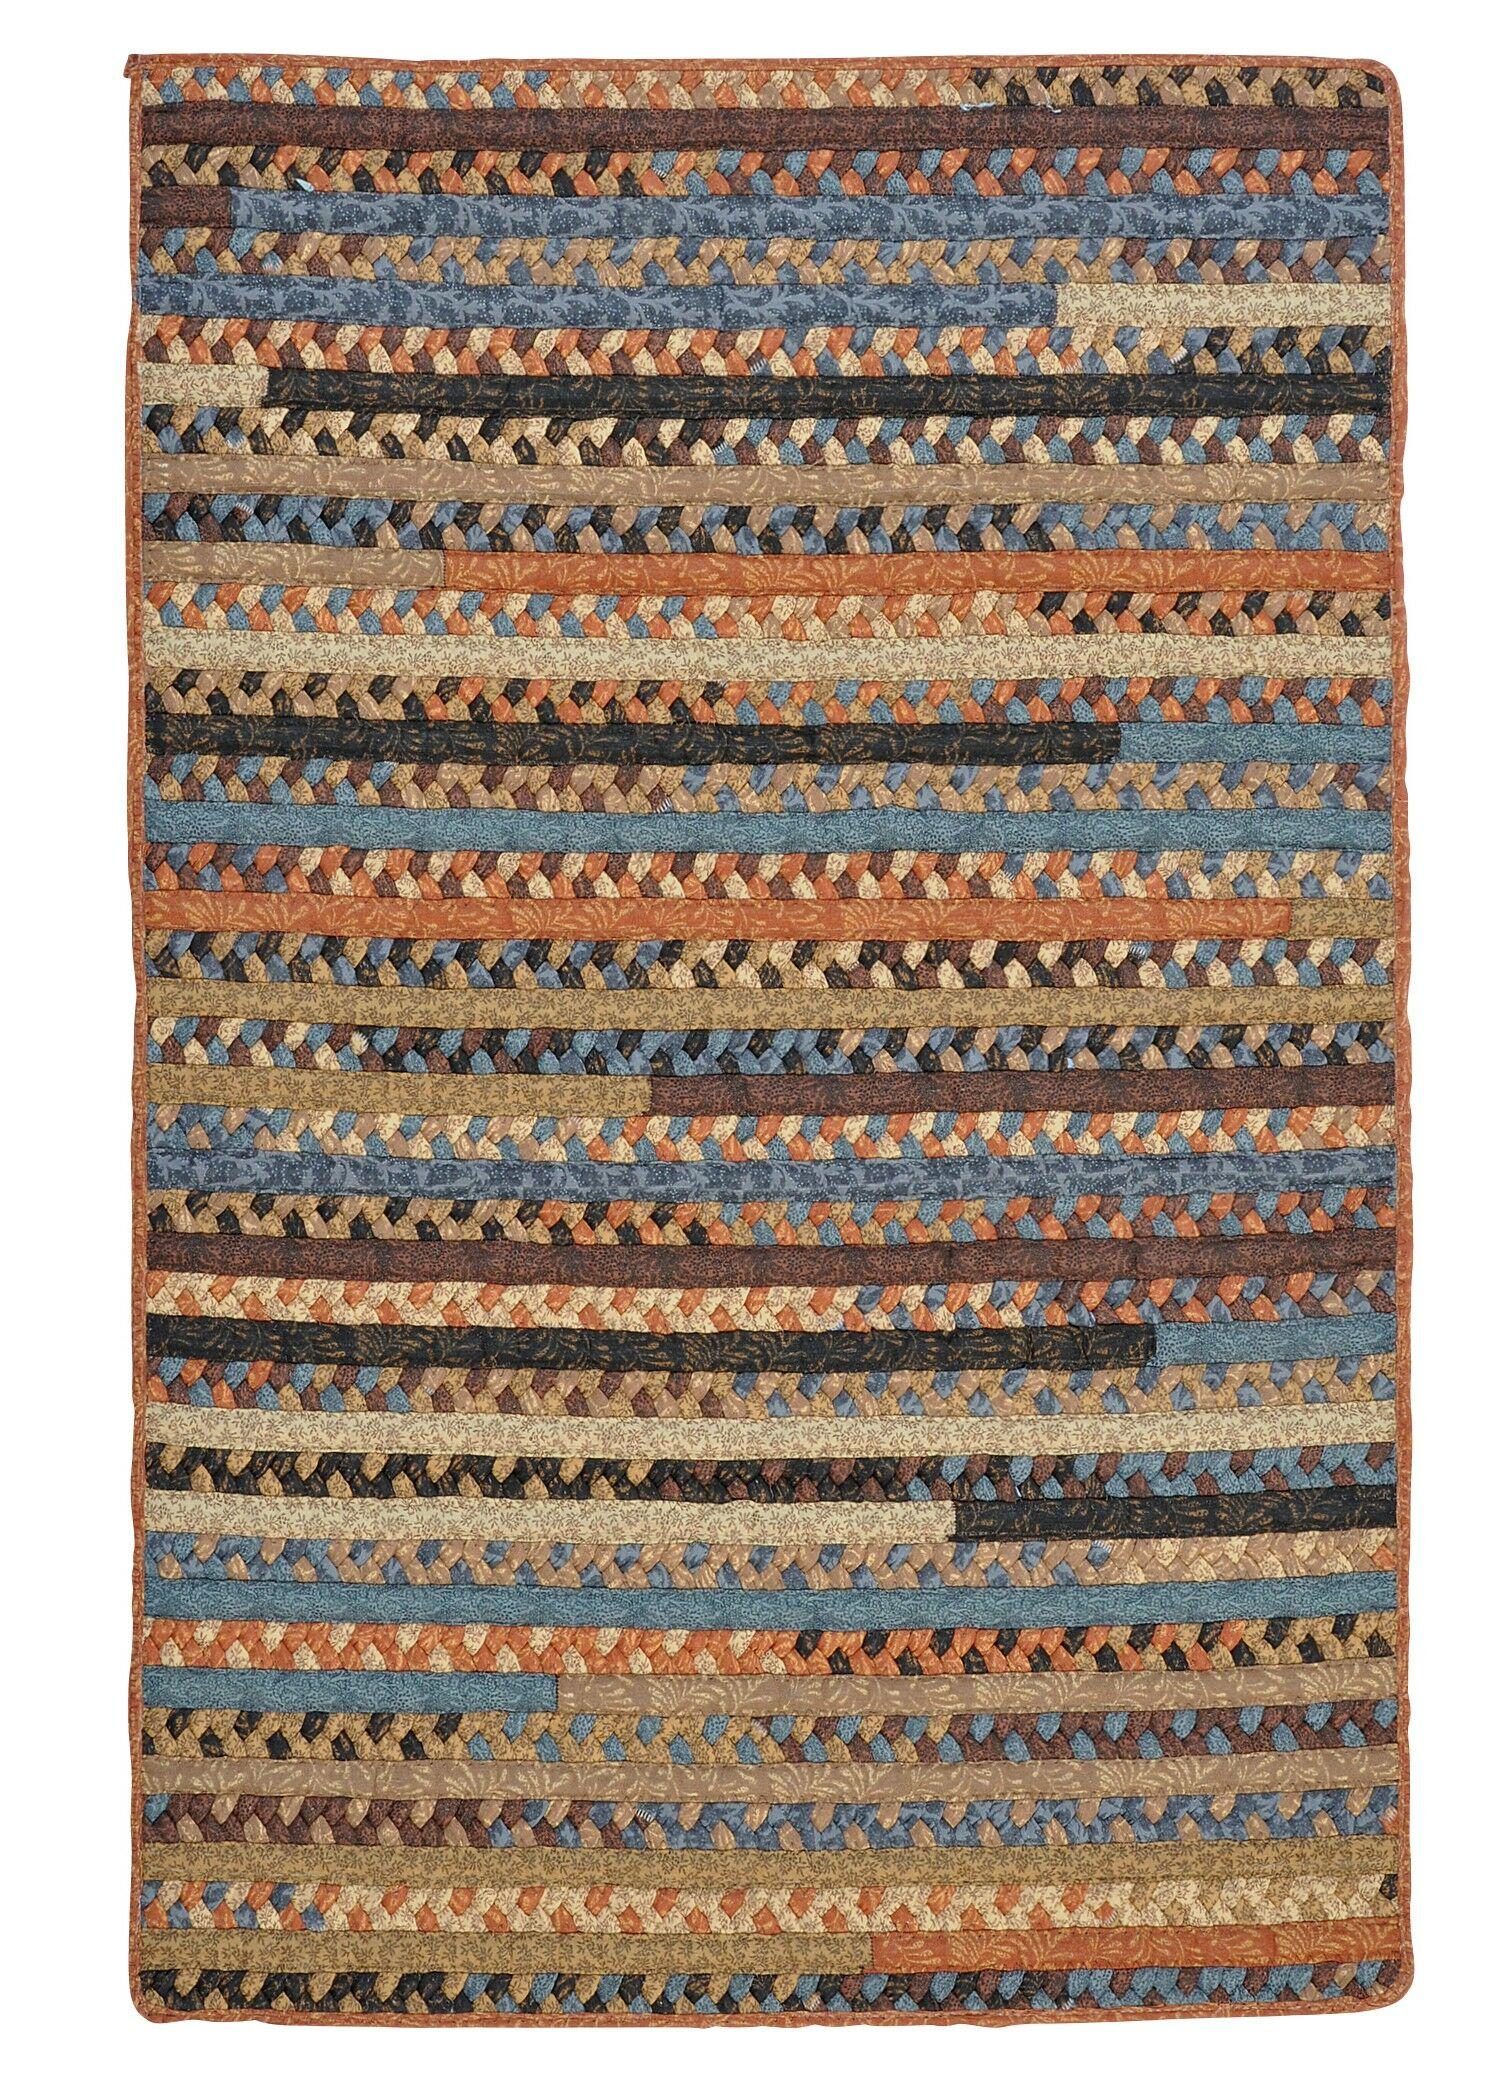 Surette Dusty Shale Area Rug Rug Size: Rectangle 7' x 9'